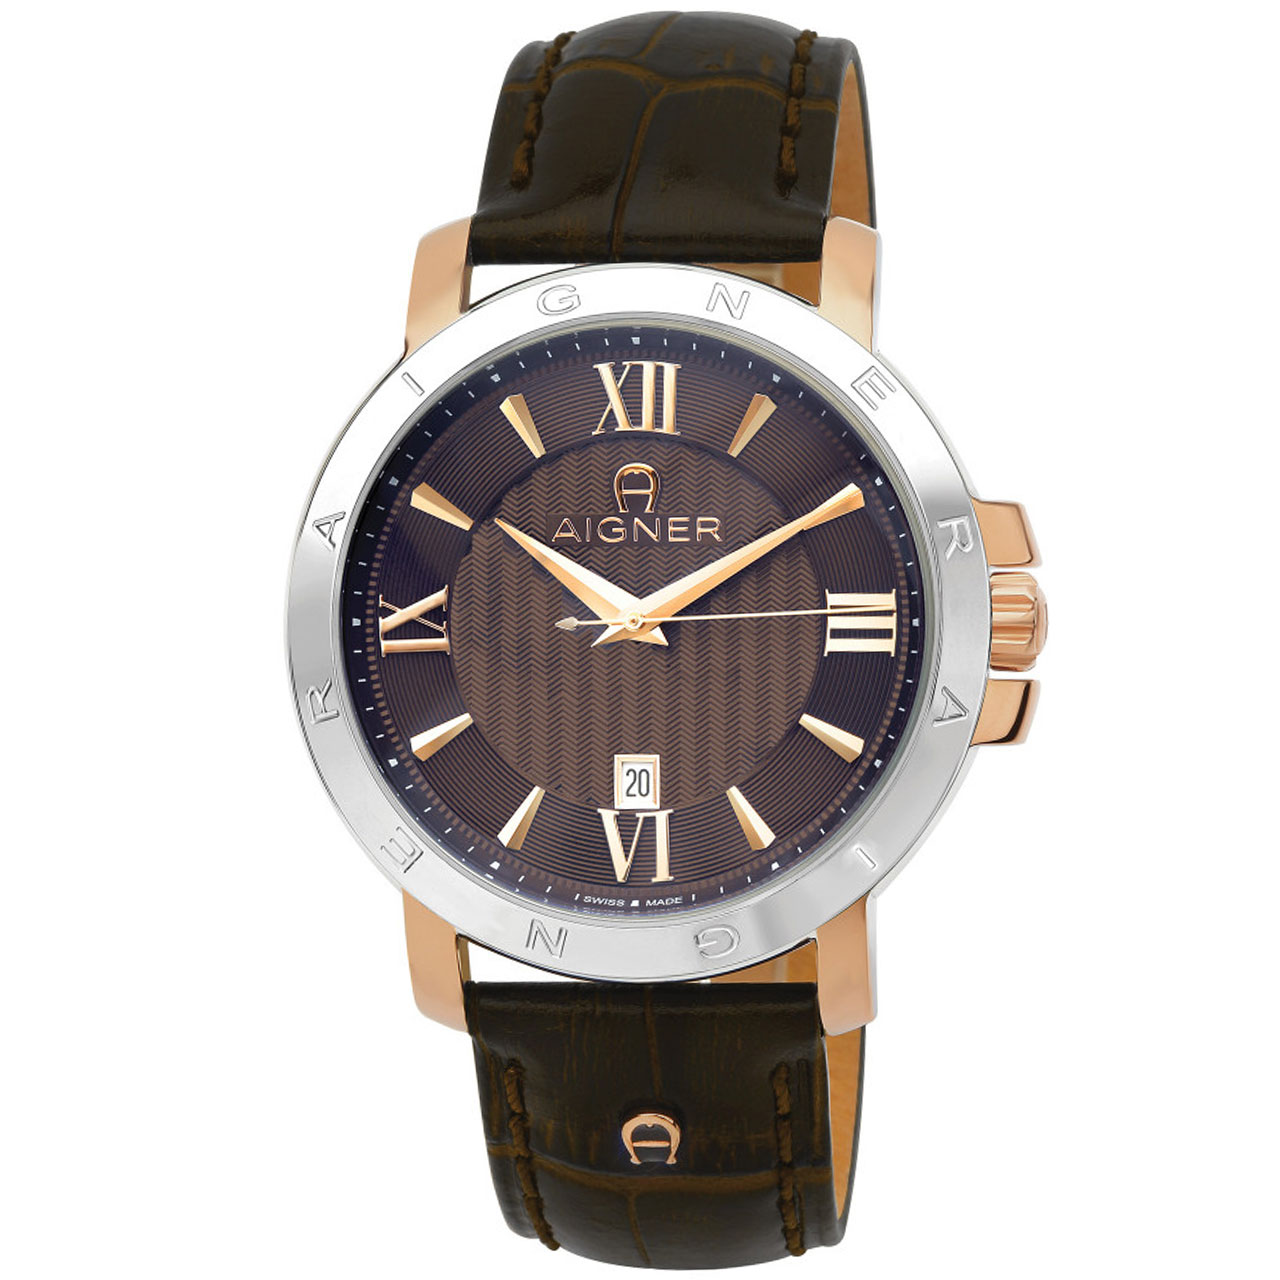 ساعت مچی عقربه ای مردانه اگنر مدل A09010 13